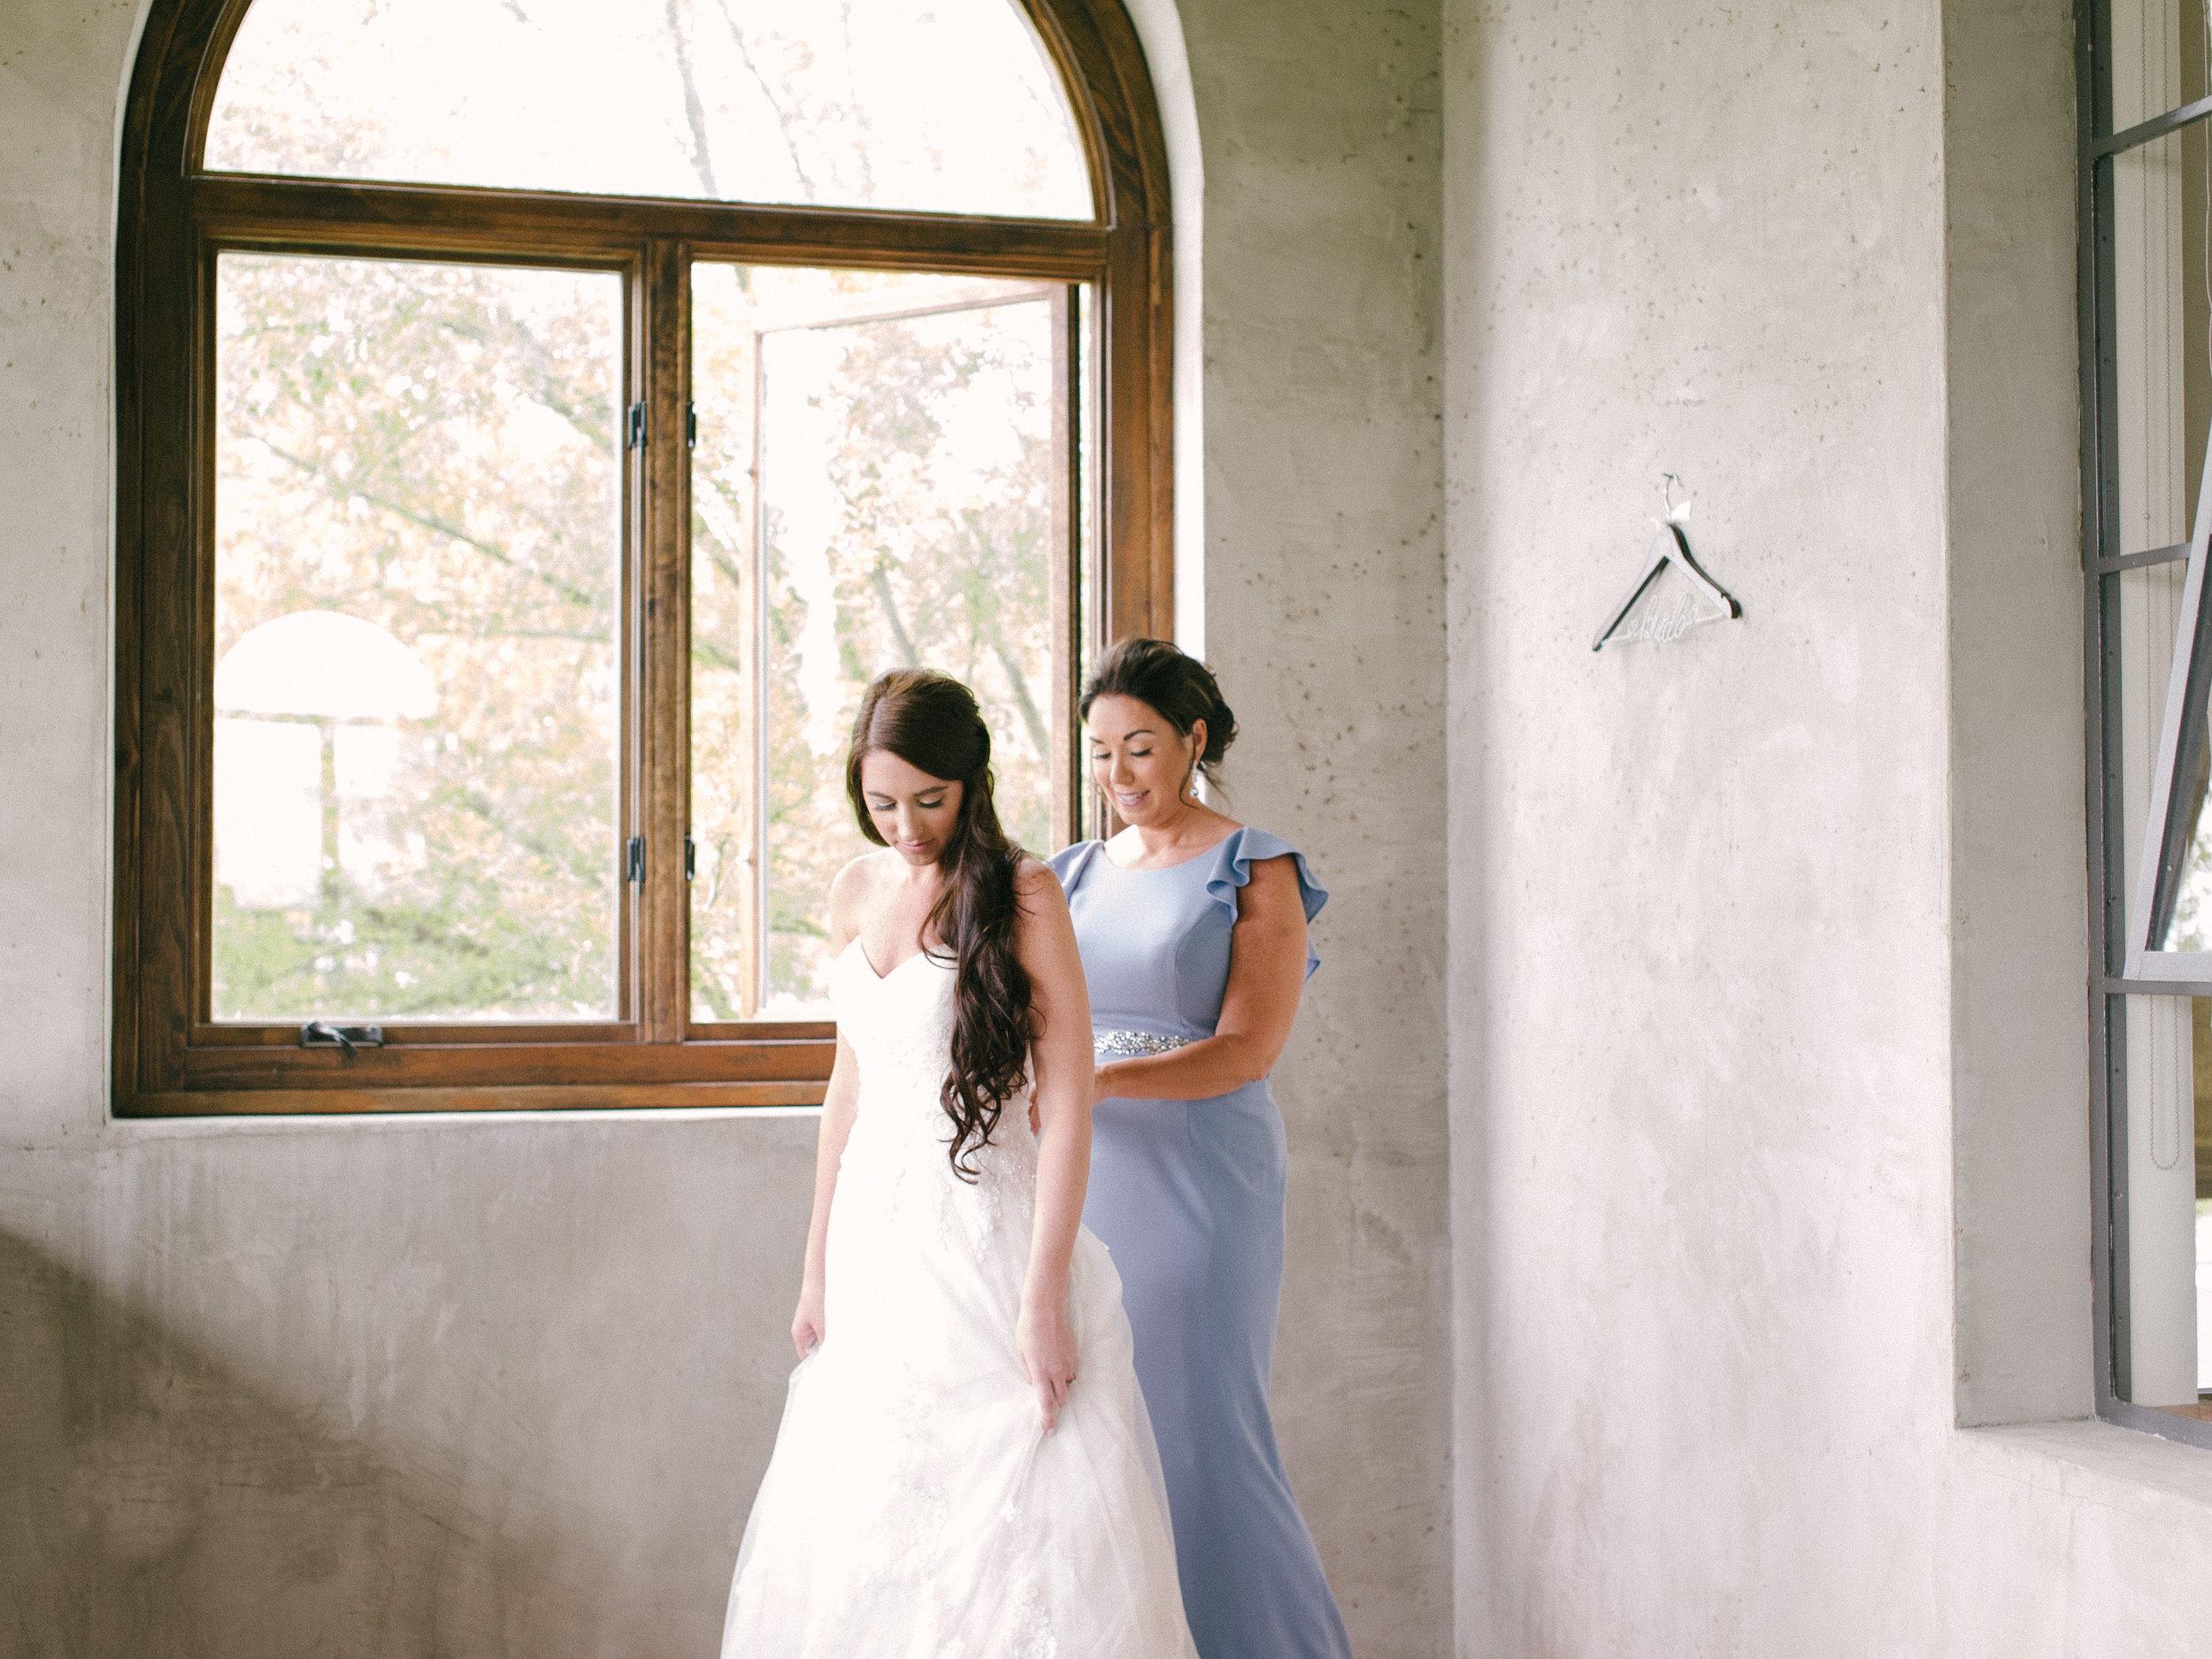 Romantic-Summerour-studio-wedding-hannah-forsberg-atlanta-wedding-photographer12.JPG